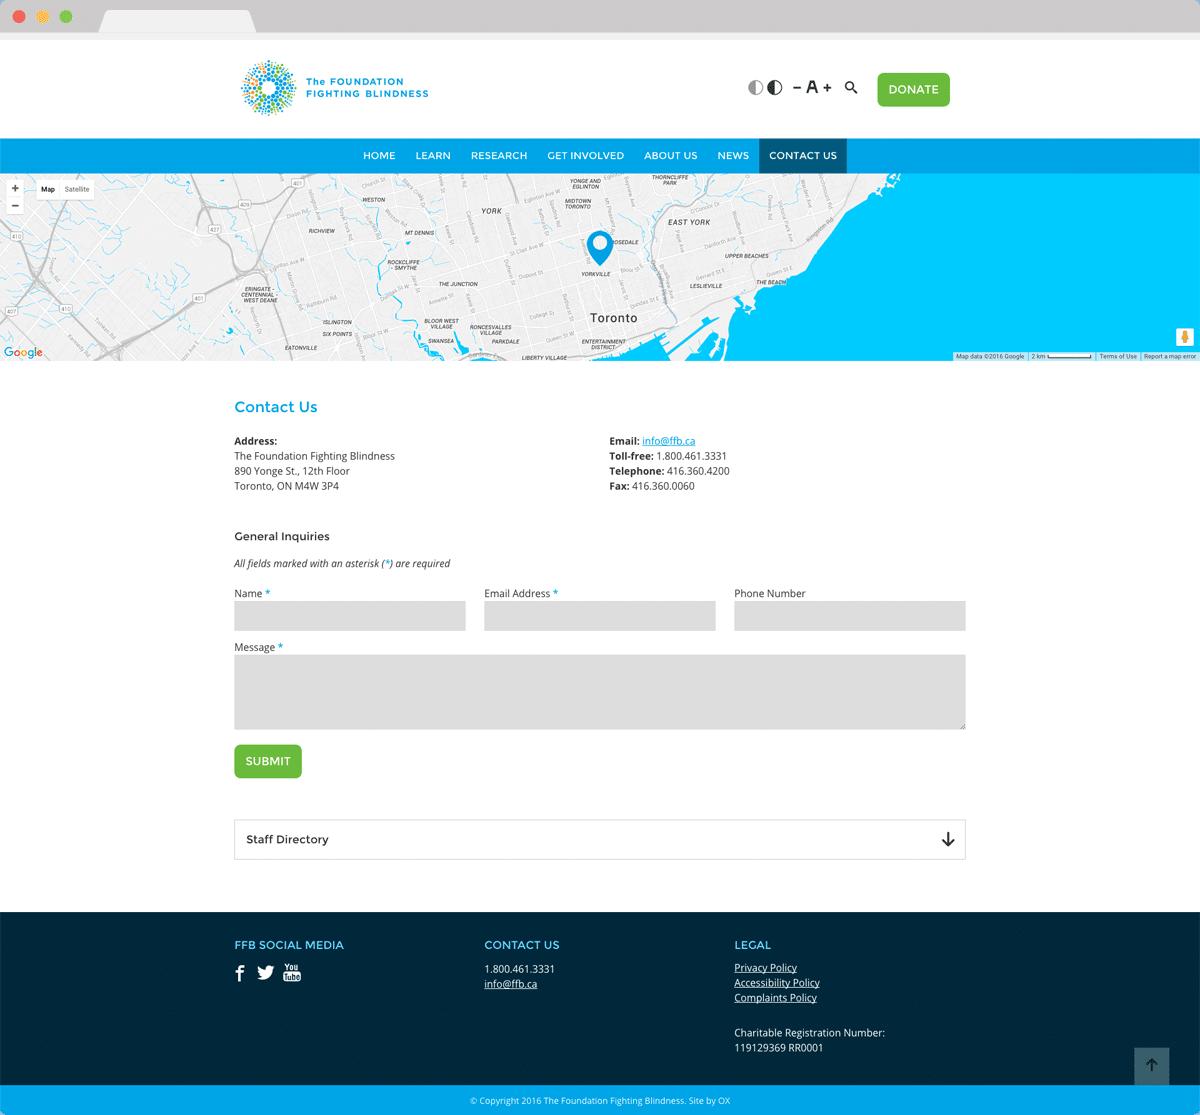 The Foundation Fighting Blindness - Website Design & Development